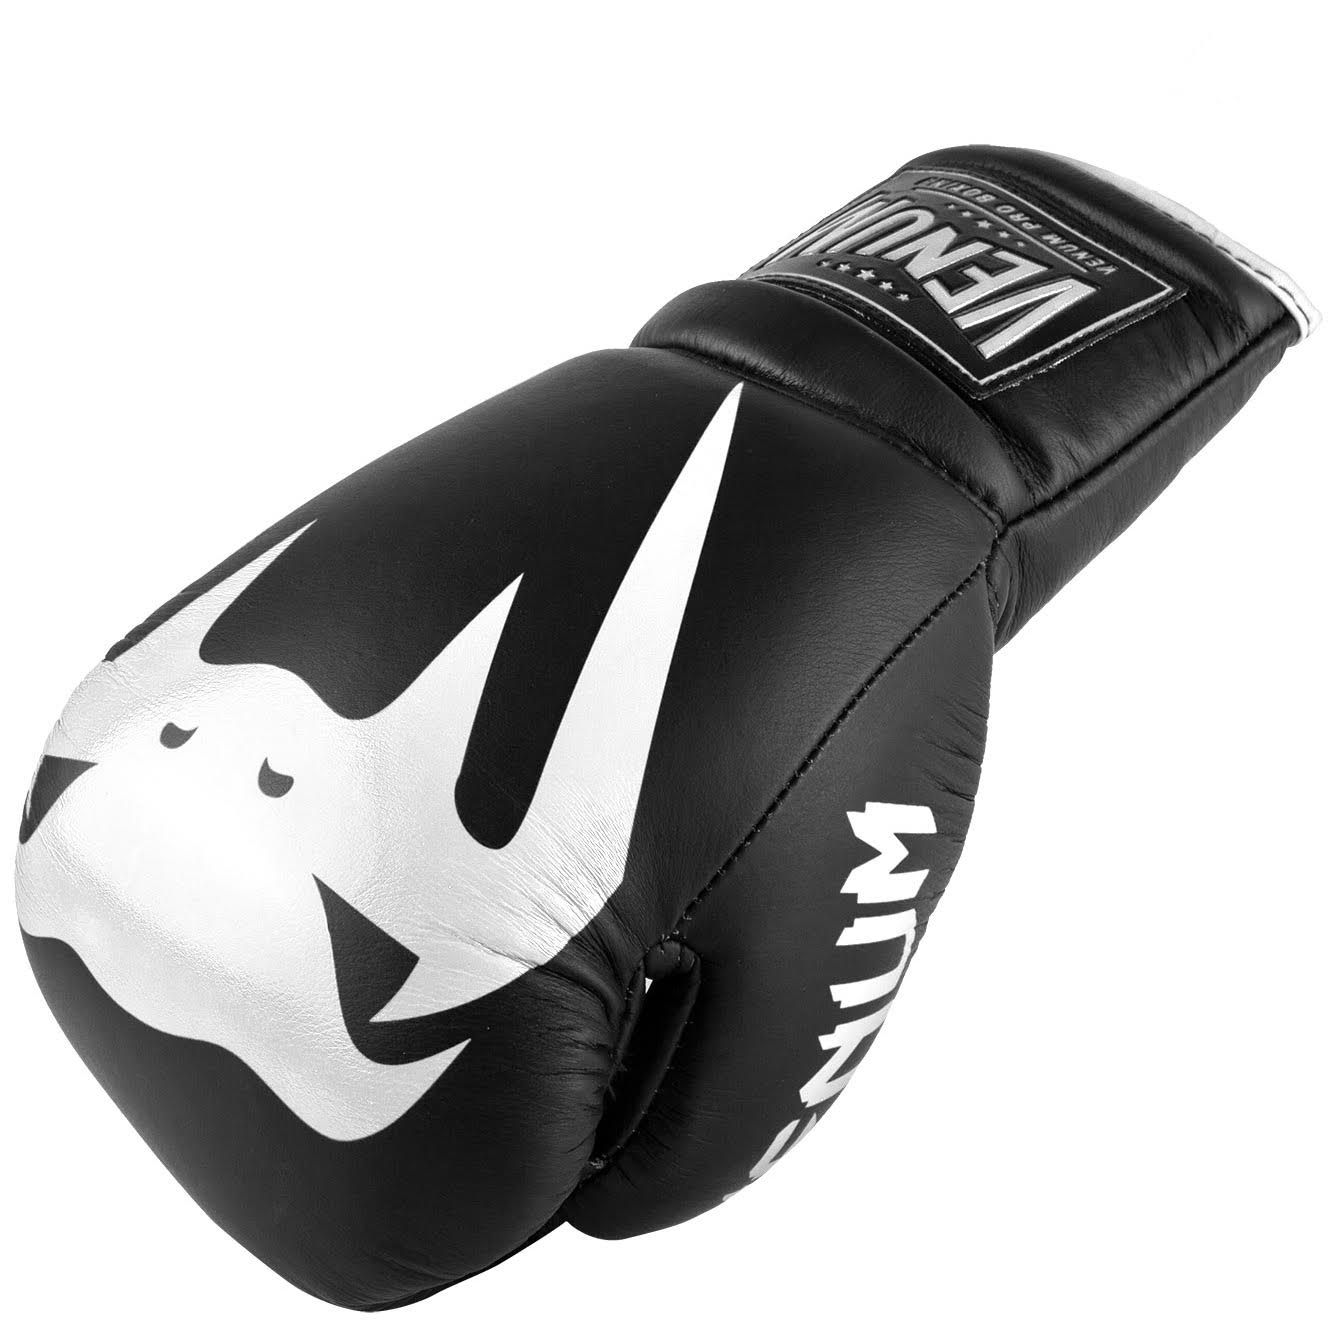 Venum Giant 2.0 Pro Boxing Gloves - With Laces - Black/White - Black/White